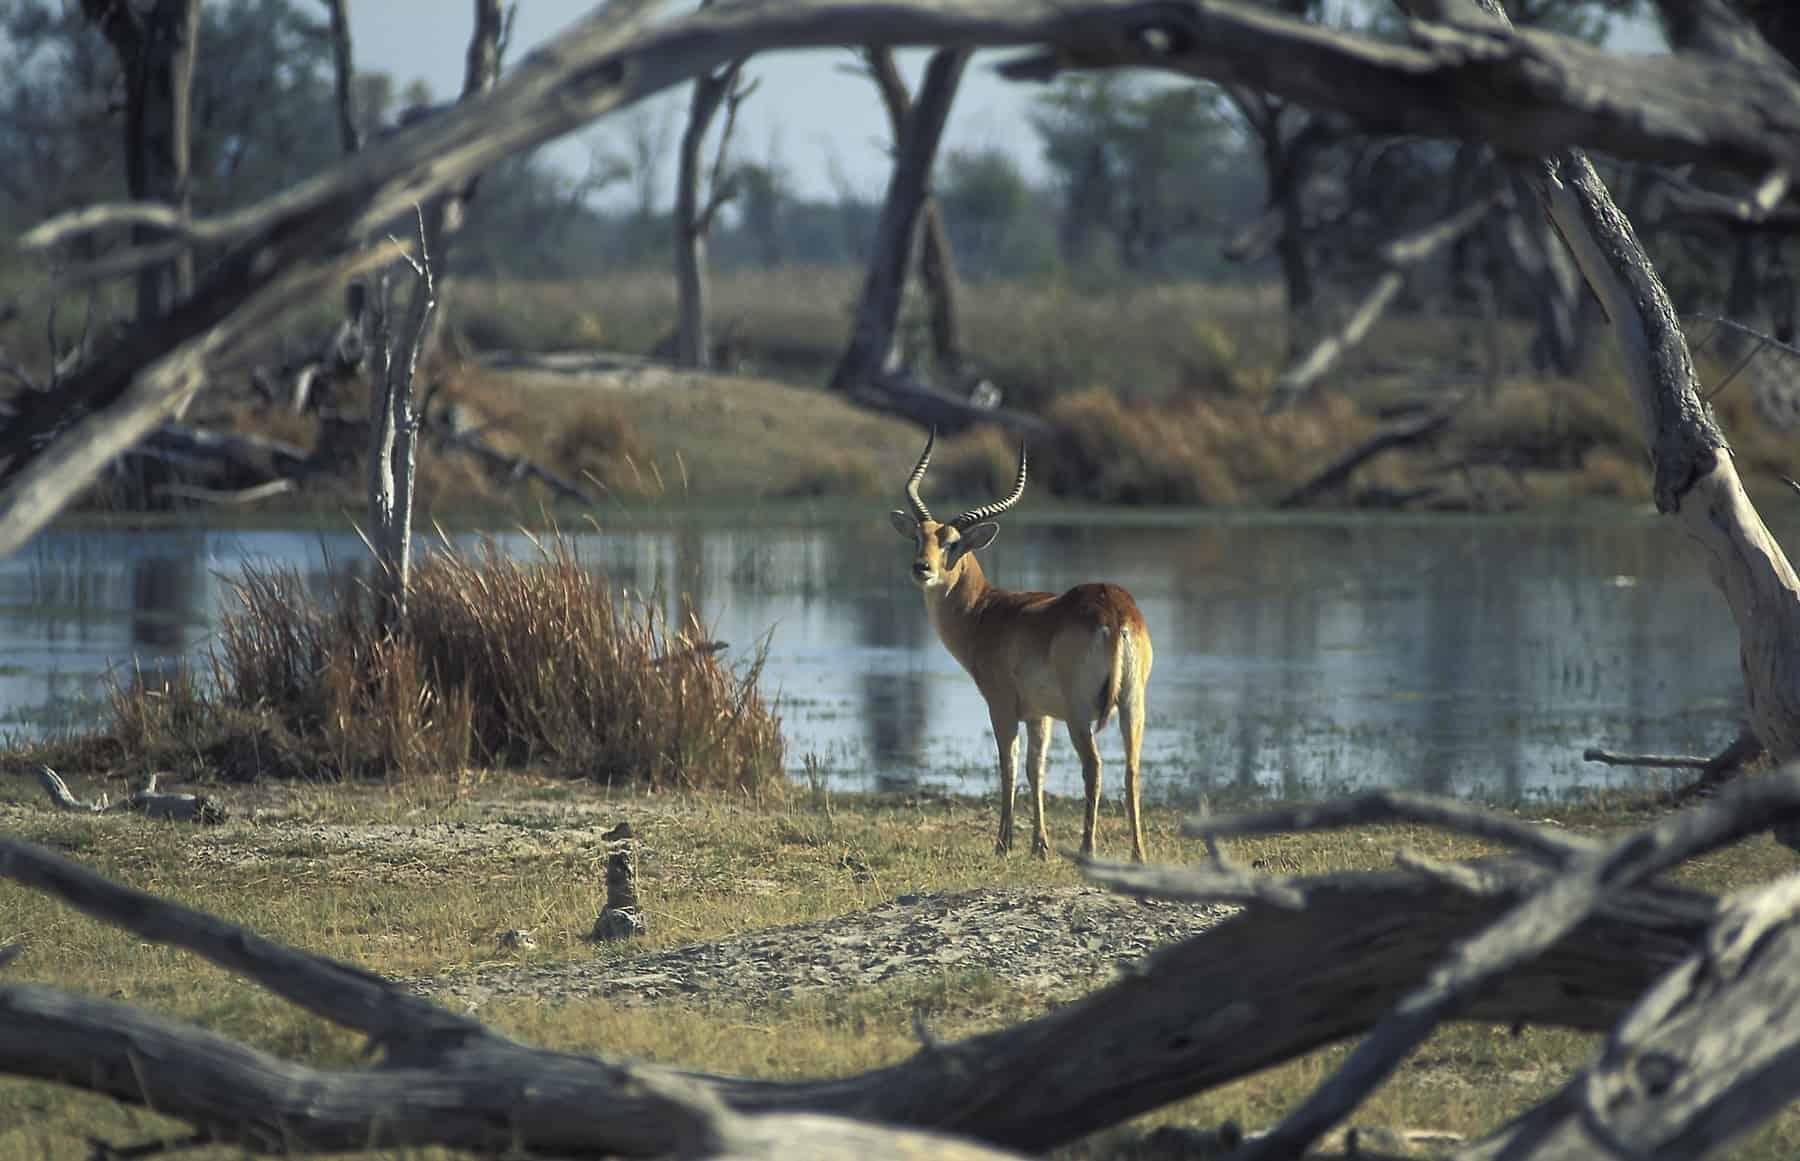 Male of red lechwe (Kobus leche). Moremi Game Reserve, Okavango Delta, Botswana.